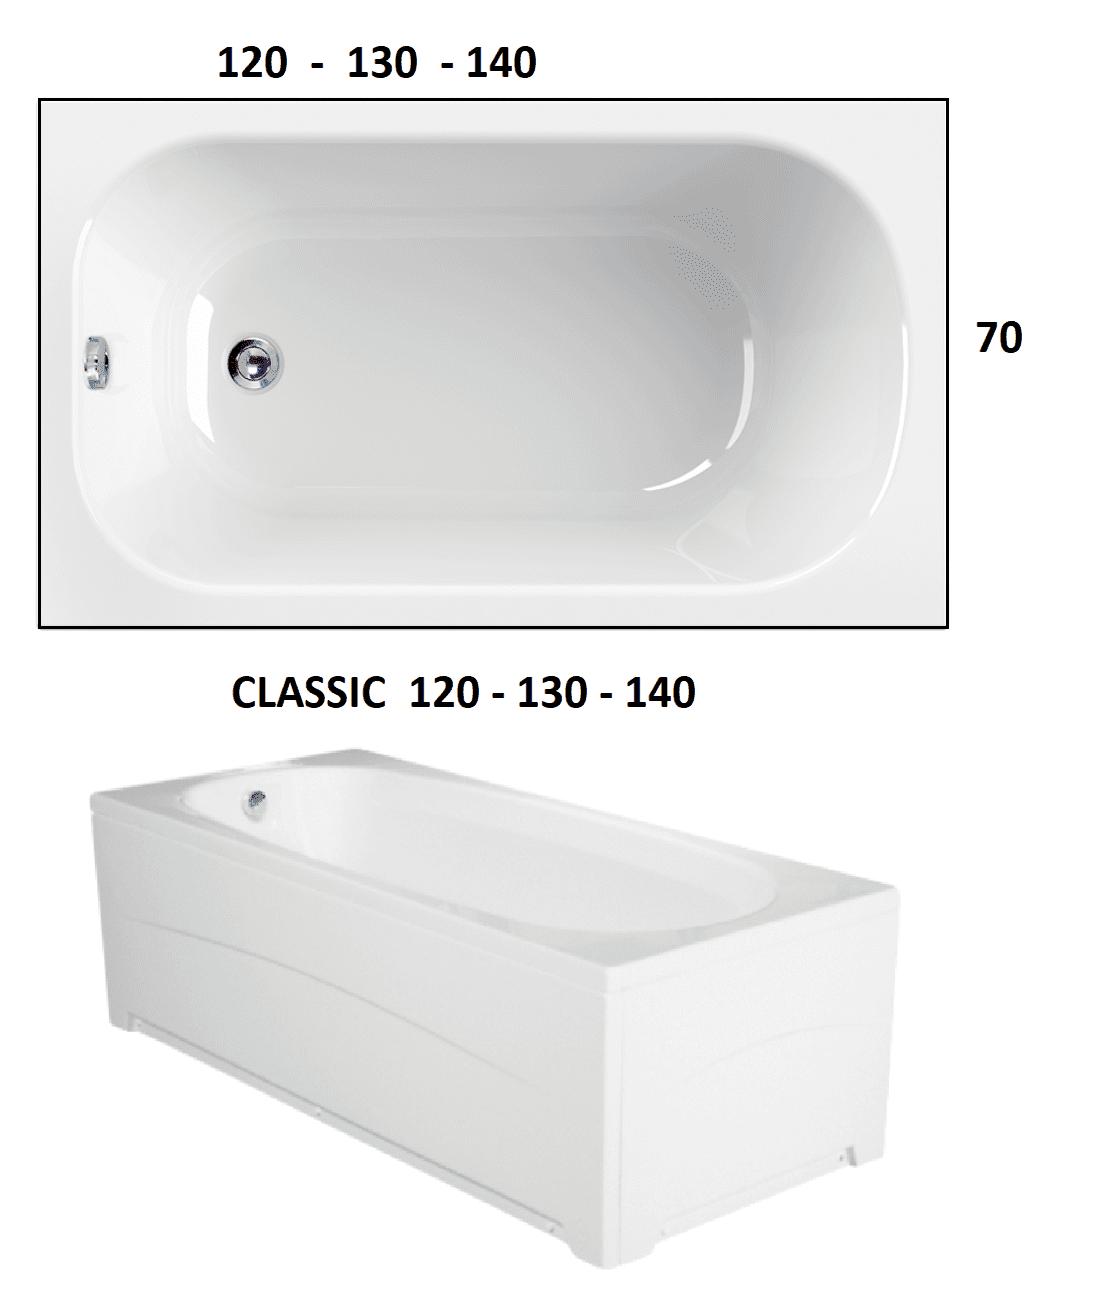 CLASSIC 120-130-140 x 70 VASCA DA BAGNO RETTANGOLARE